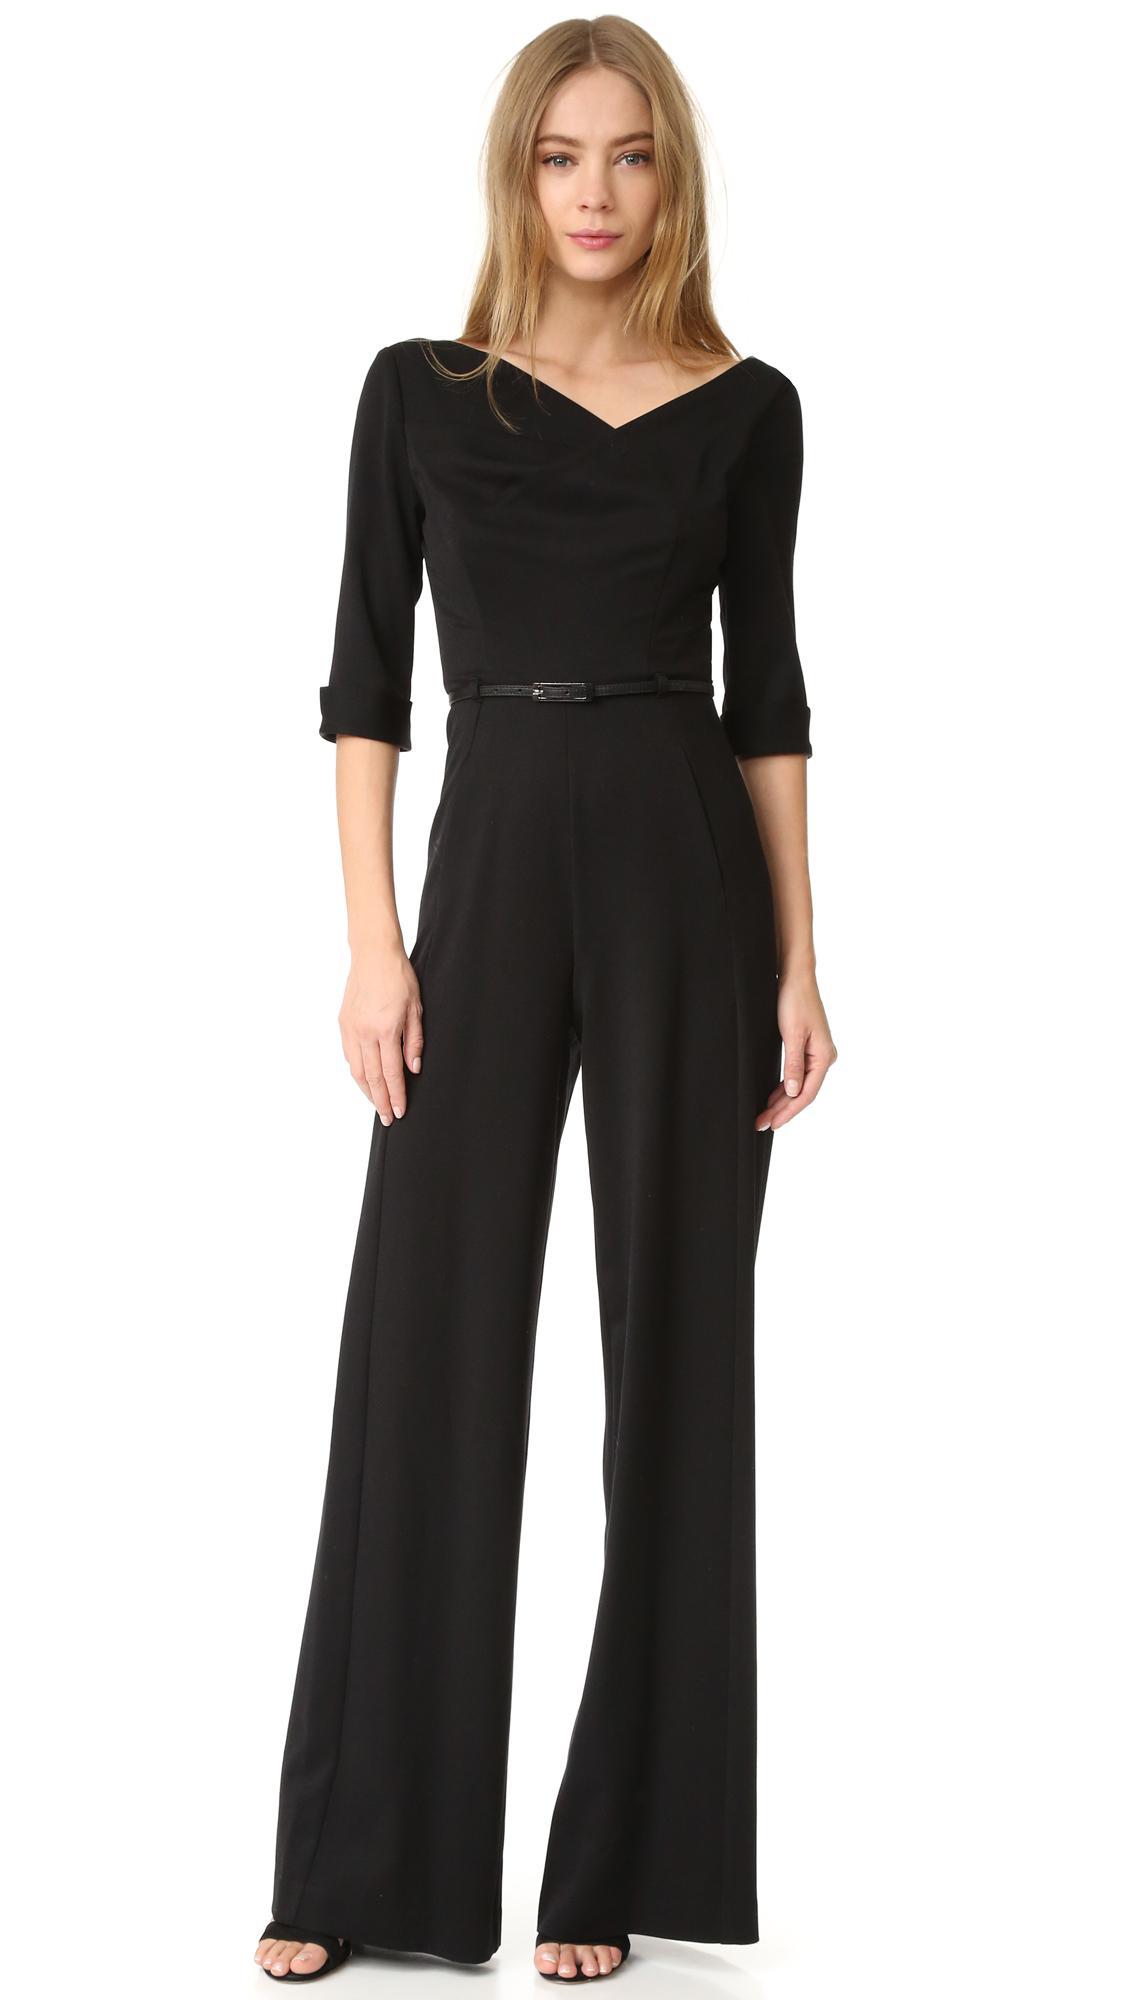 ce5c1fe011fc Lyst - Black Halo 3 4 Sleeve Jackie Jumpsuit in Black